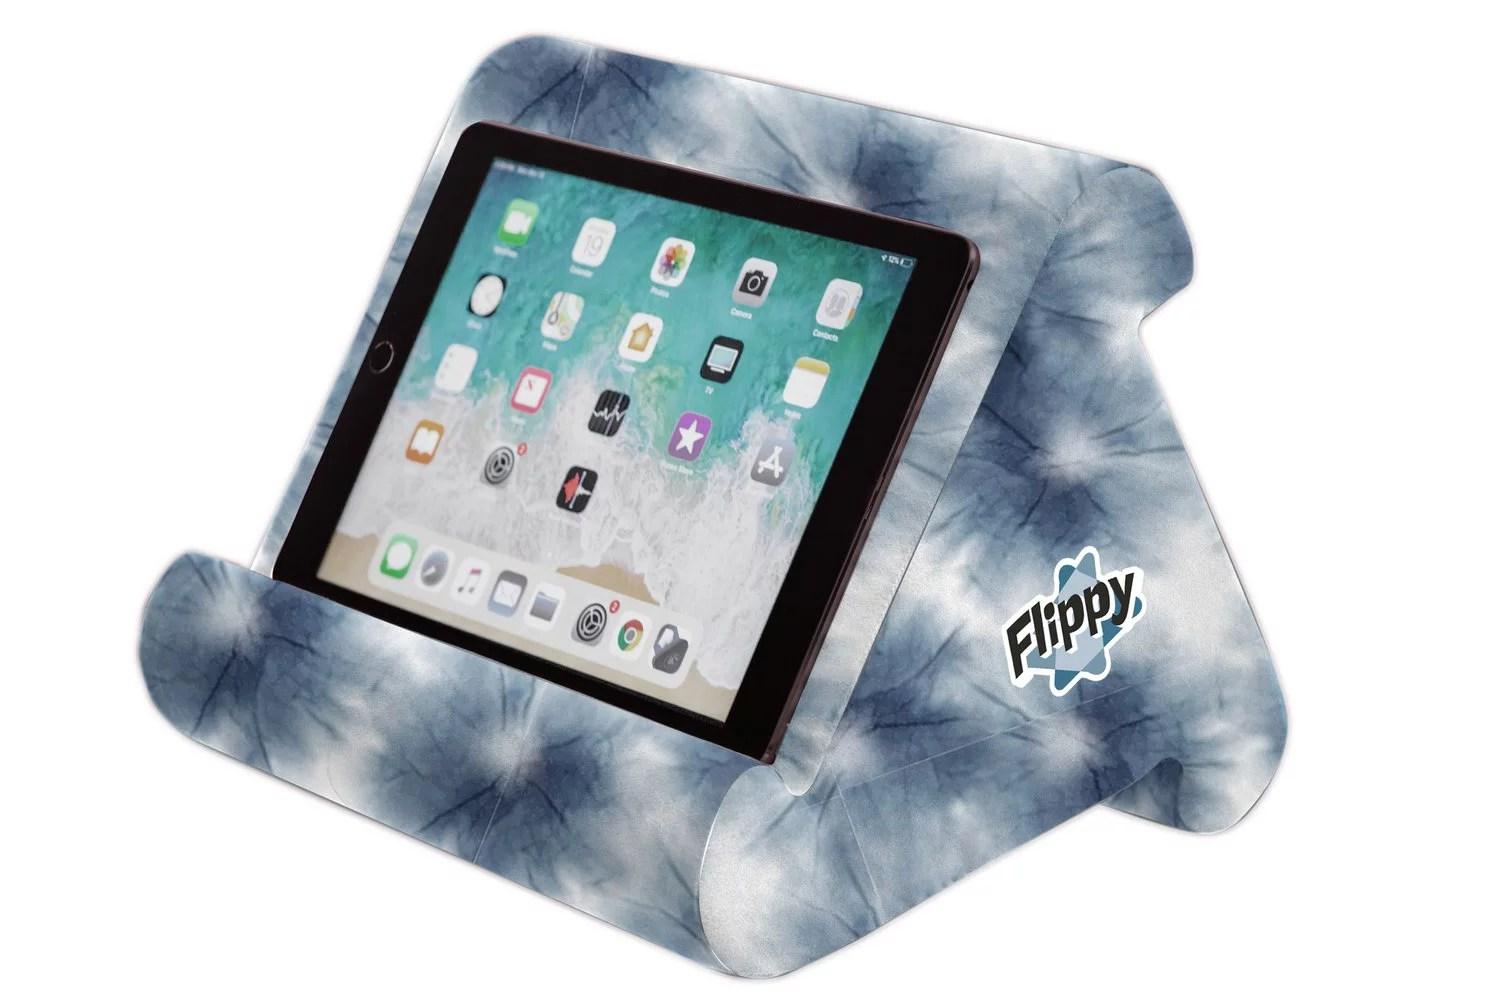 the original flippy multi angle soft pillow lap stand for ipads tablets ereaders smartphones books magazines walmart com walmart com